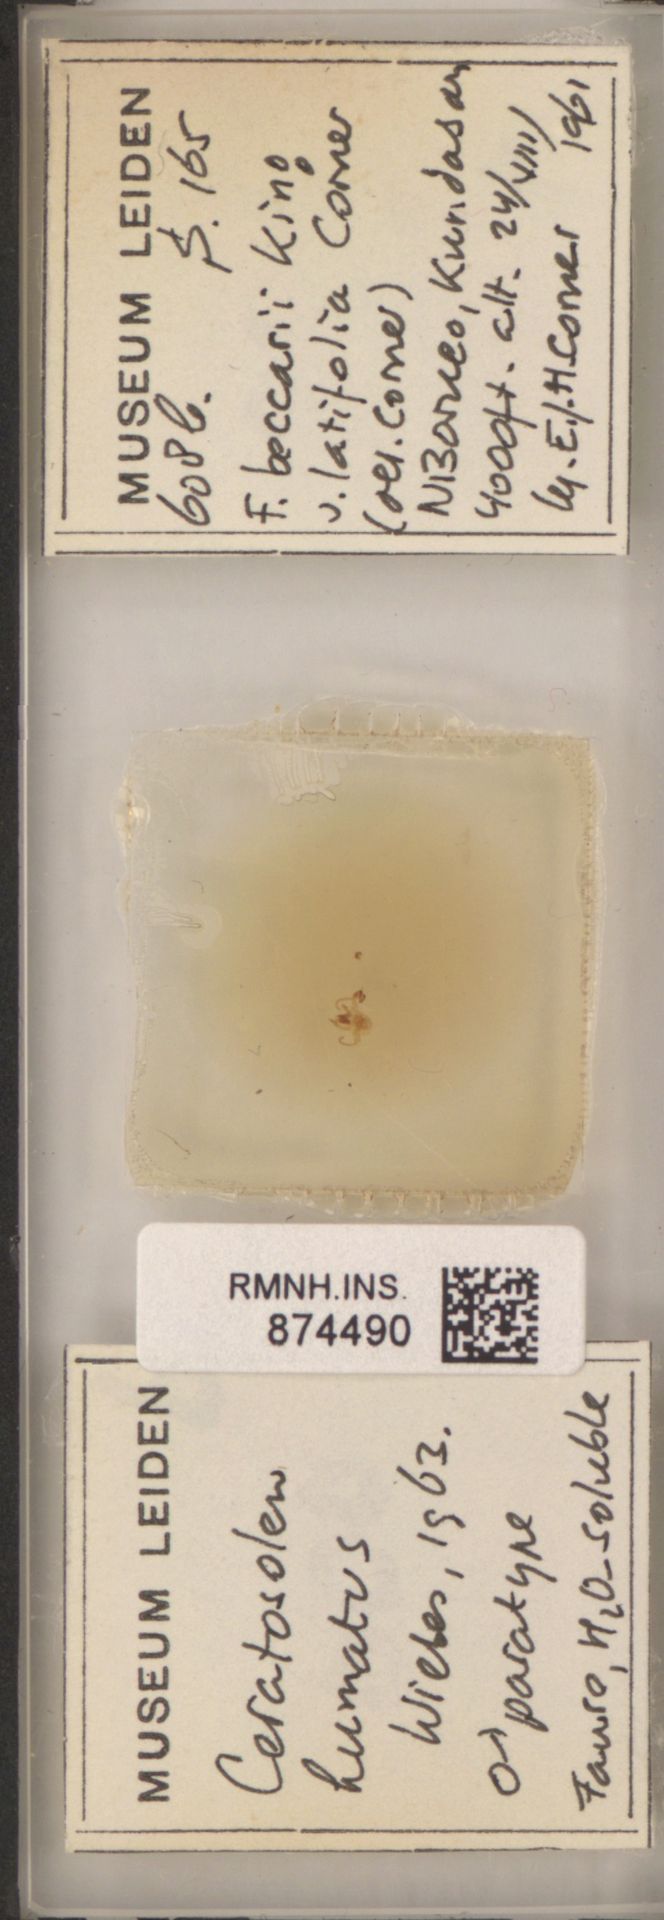 RMNH.INS.874490 | Ceratosolen lumatus Wiebes, 1963